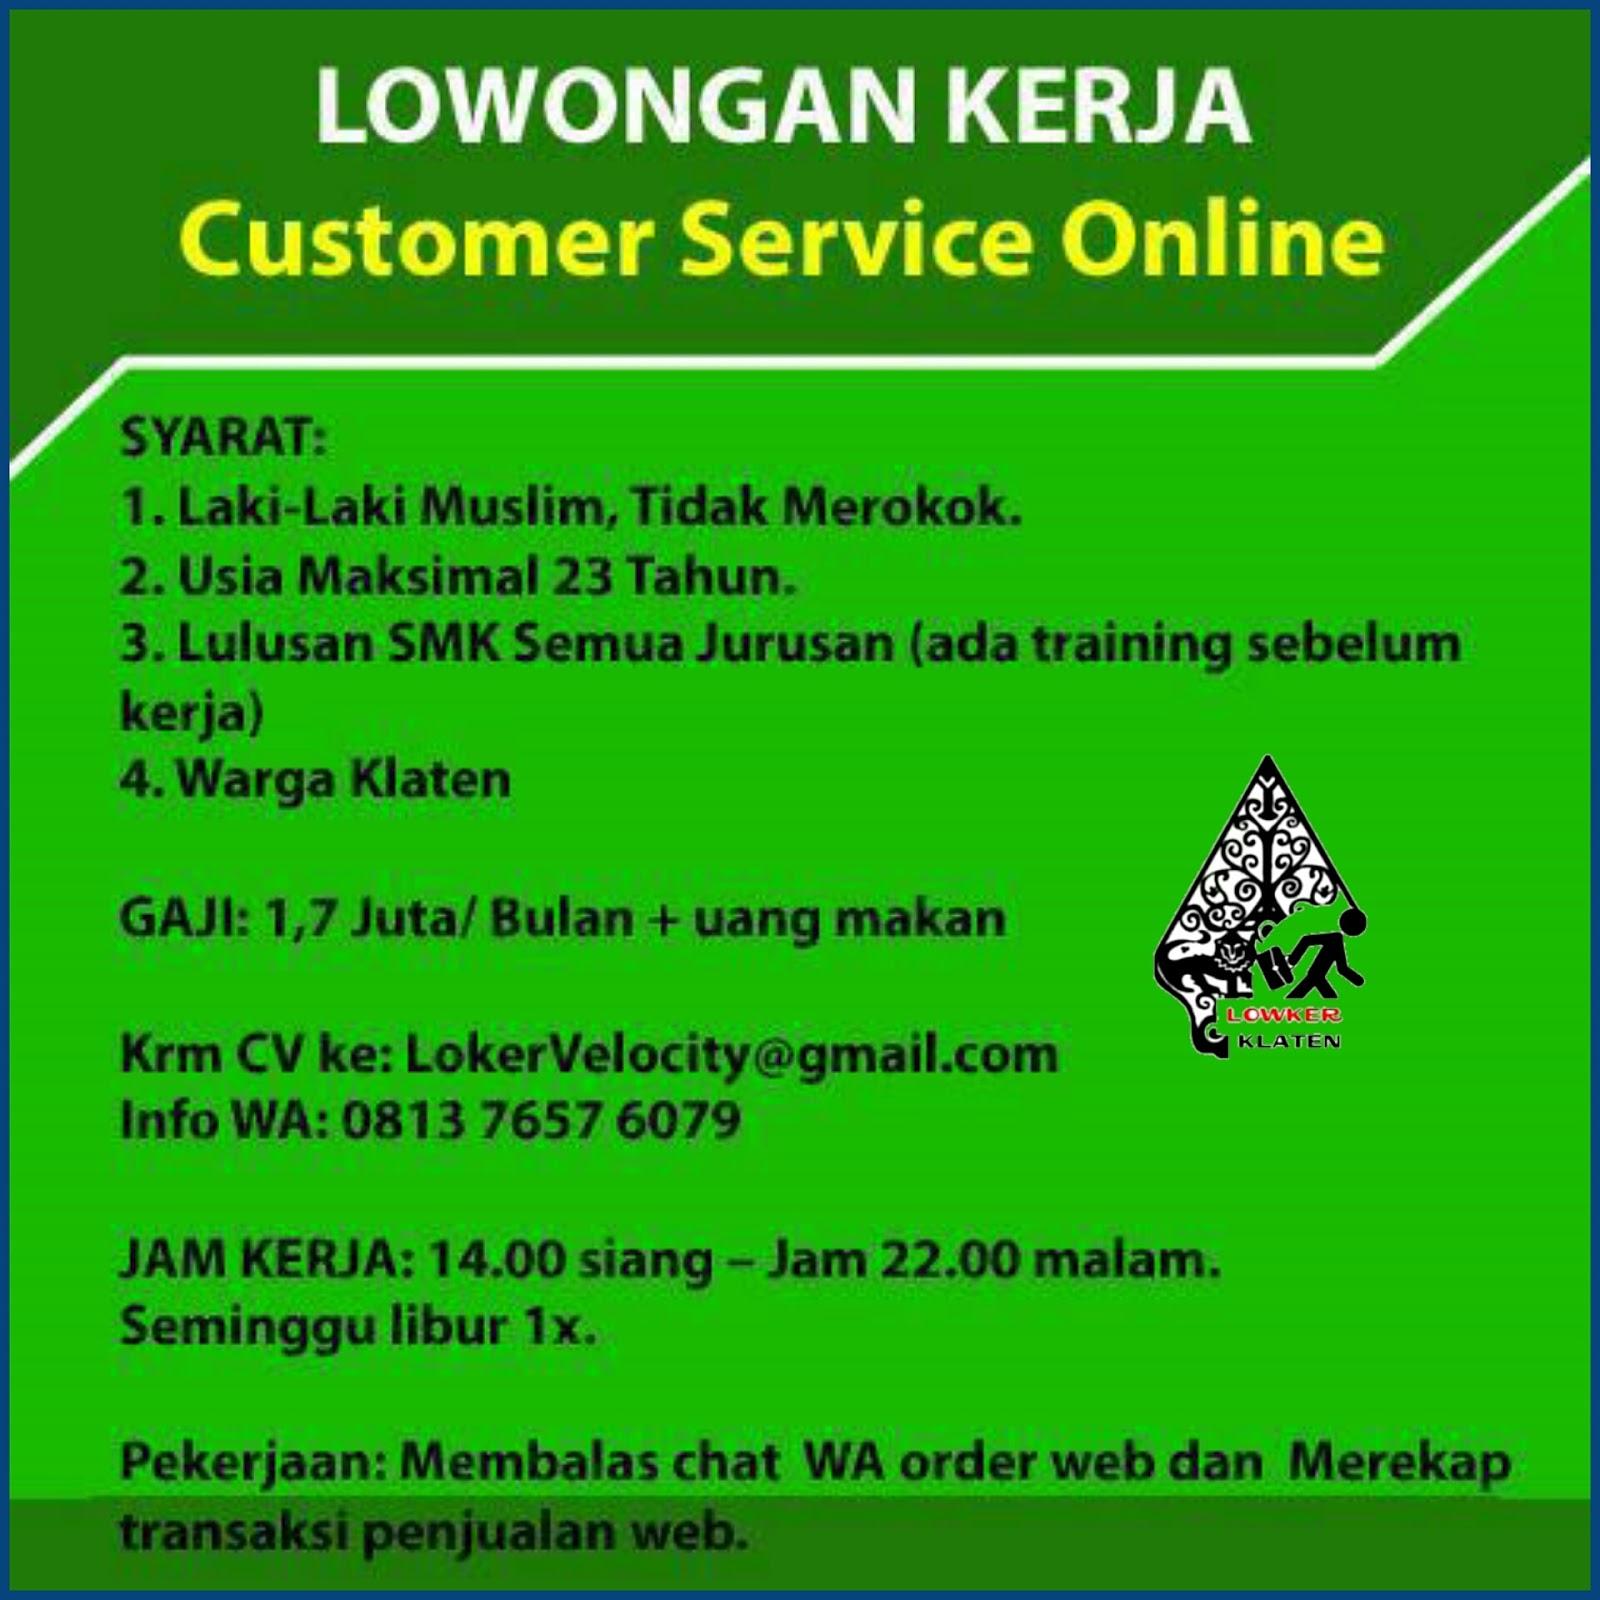 Lowongan Kerja Customer Service Online Velocity